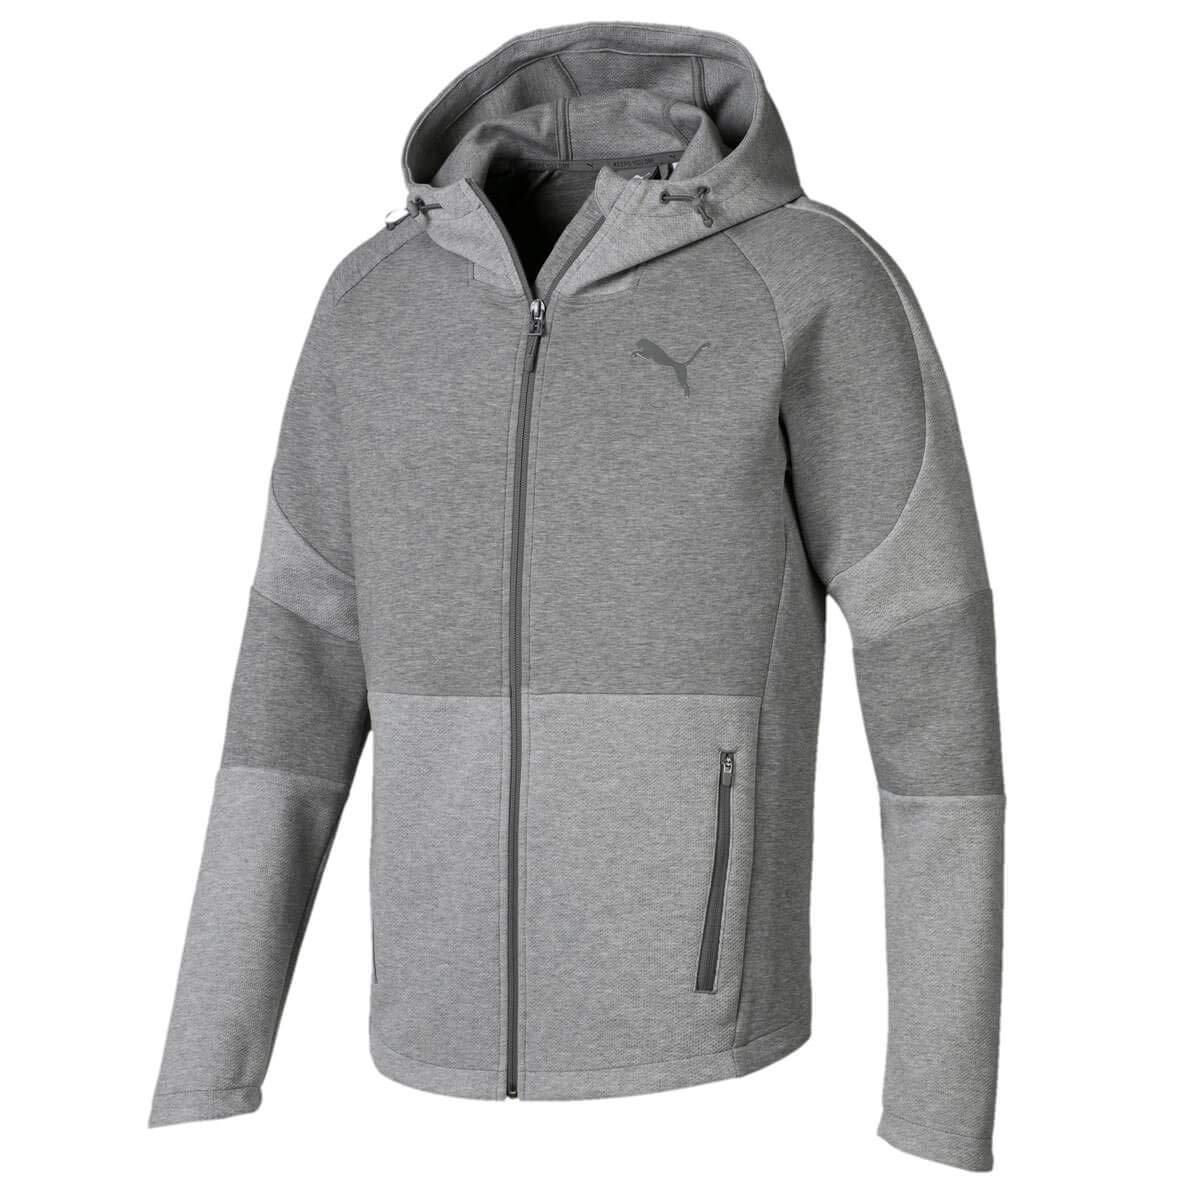 TALLA M. Puma Evostripe Move Hooded Jacket Sudadera, Hombre